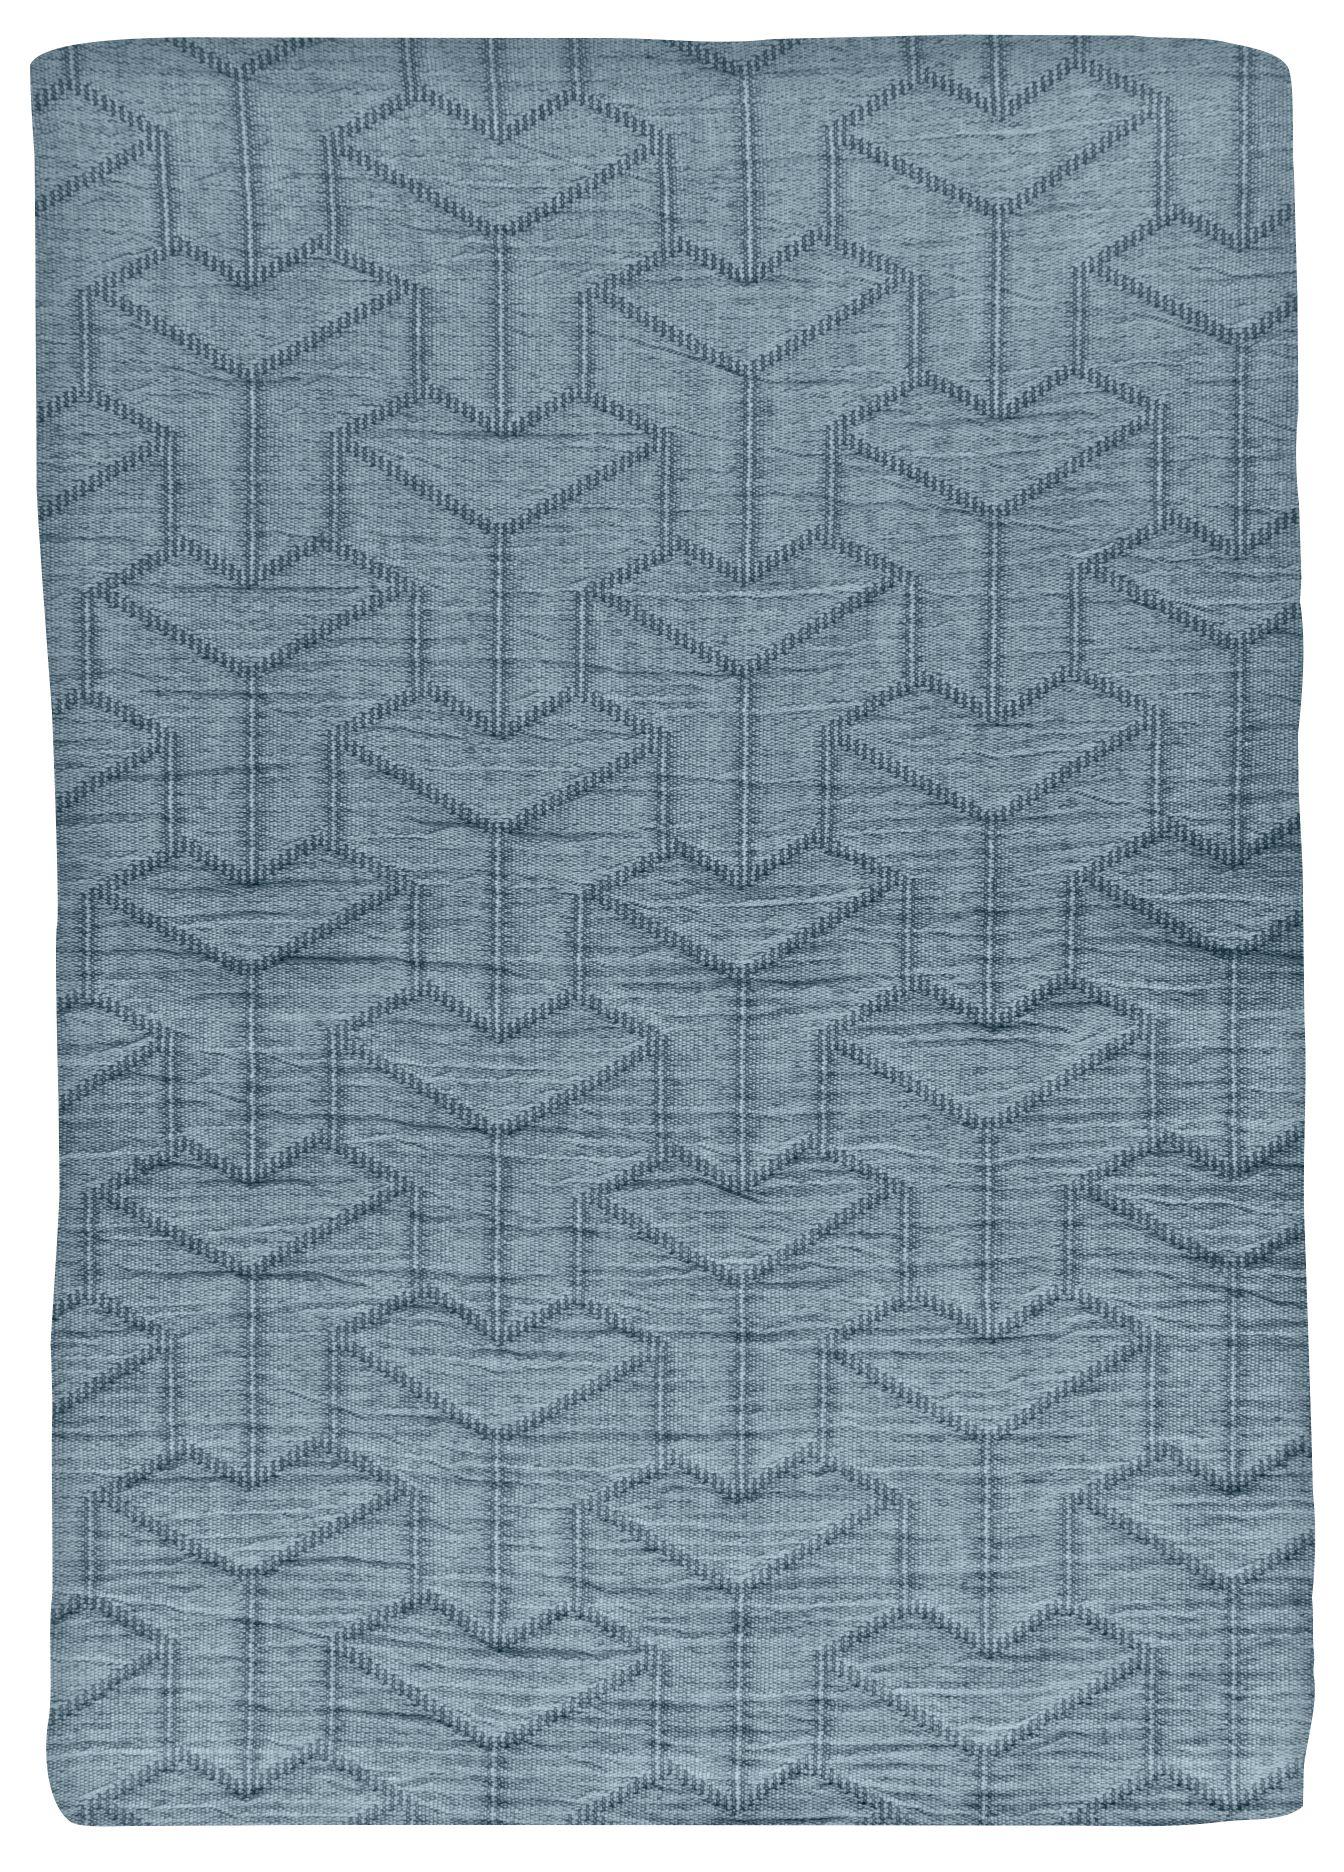 Mette Ditmer Trio sengetæppe, 250x250 cm, petrol blue